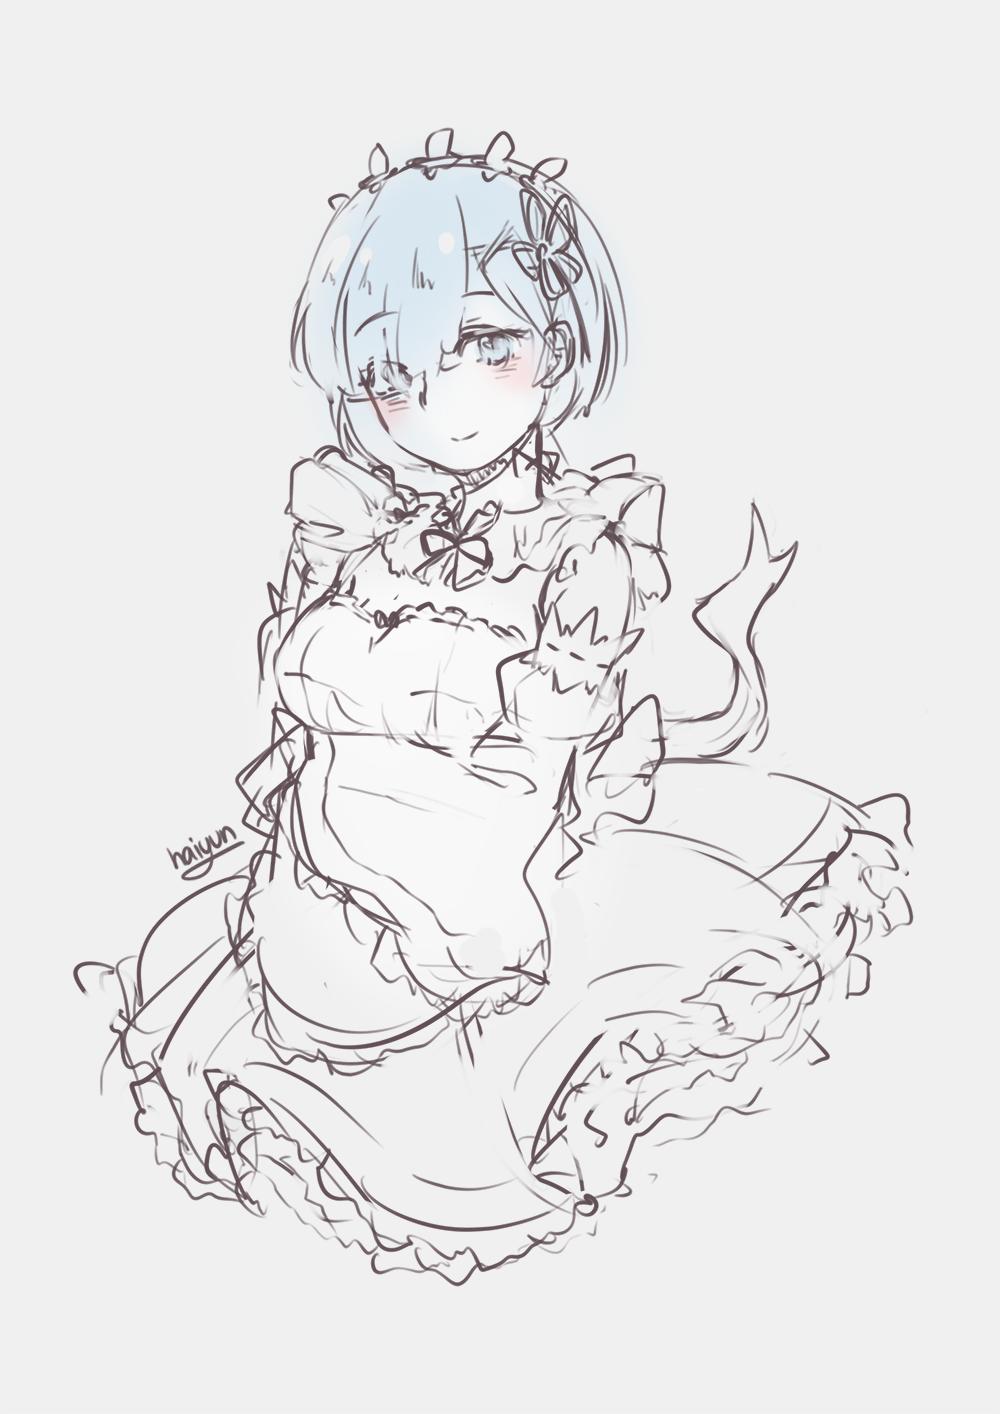 rezero rem draft.png